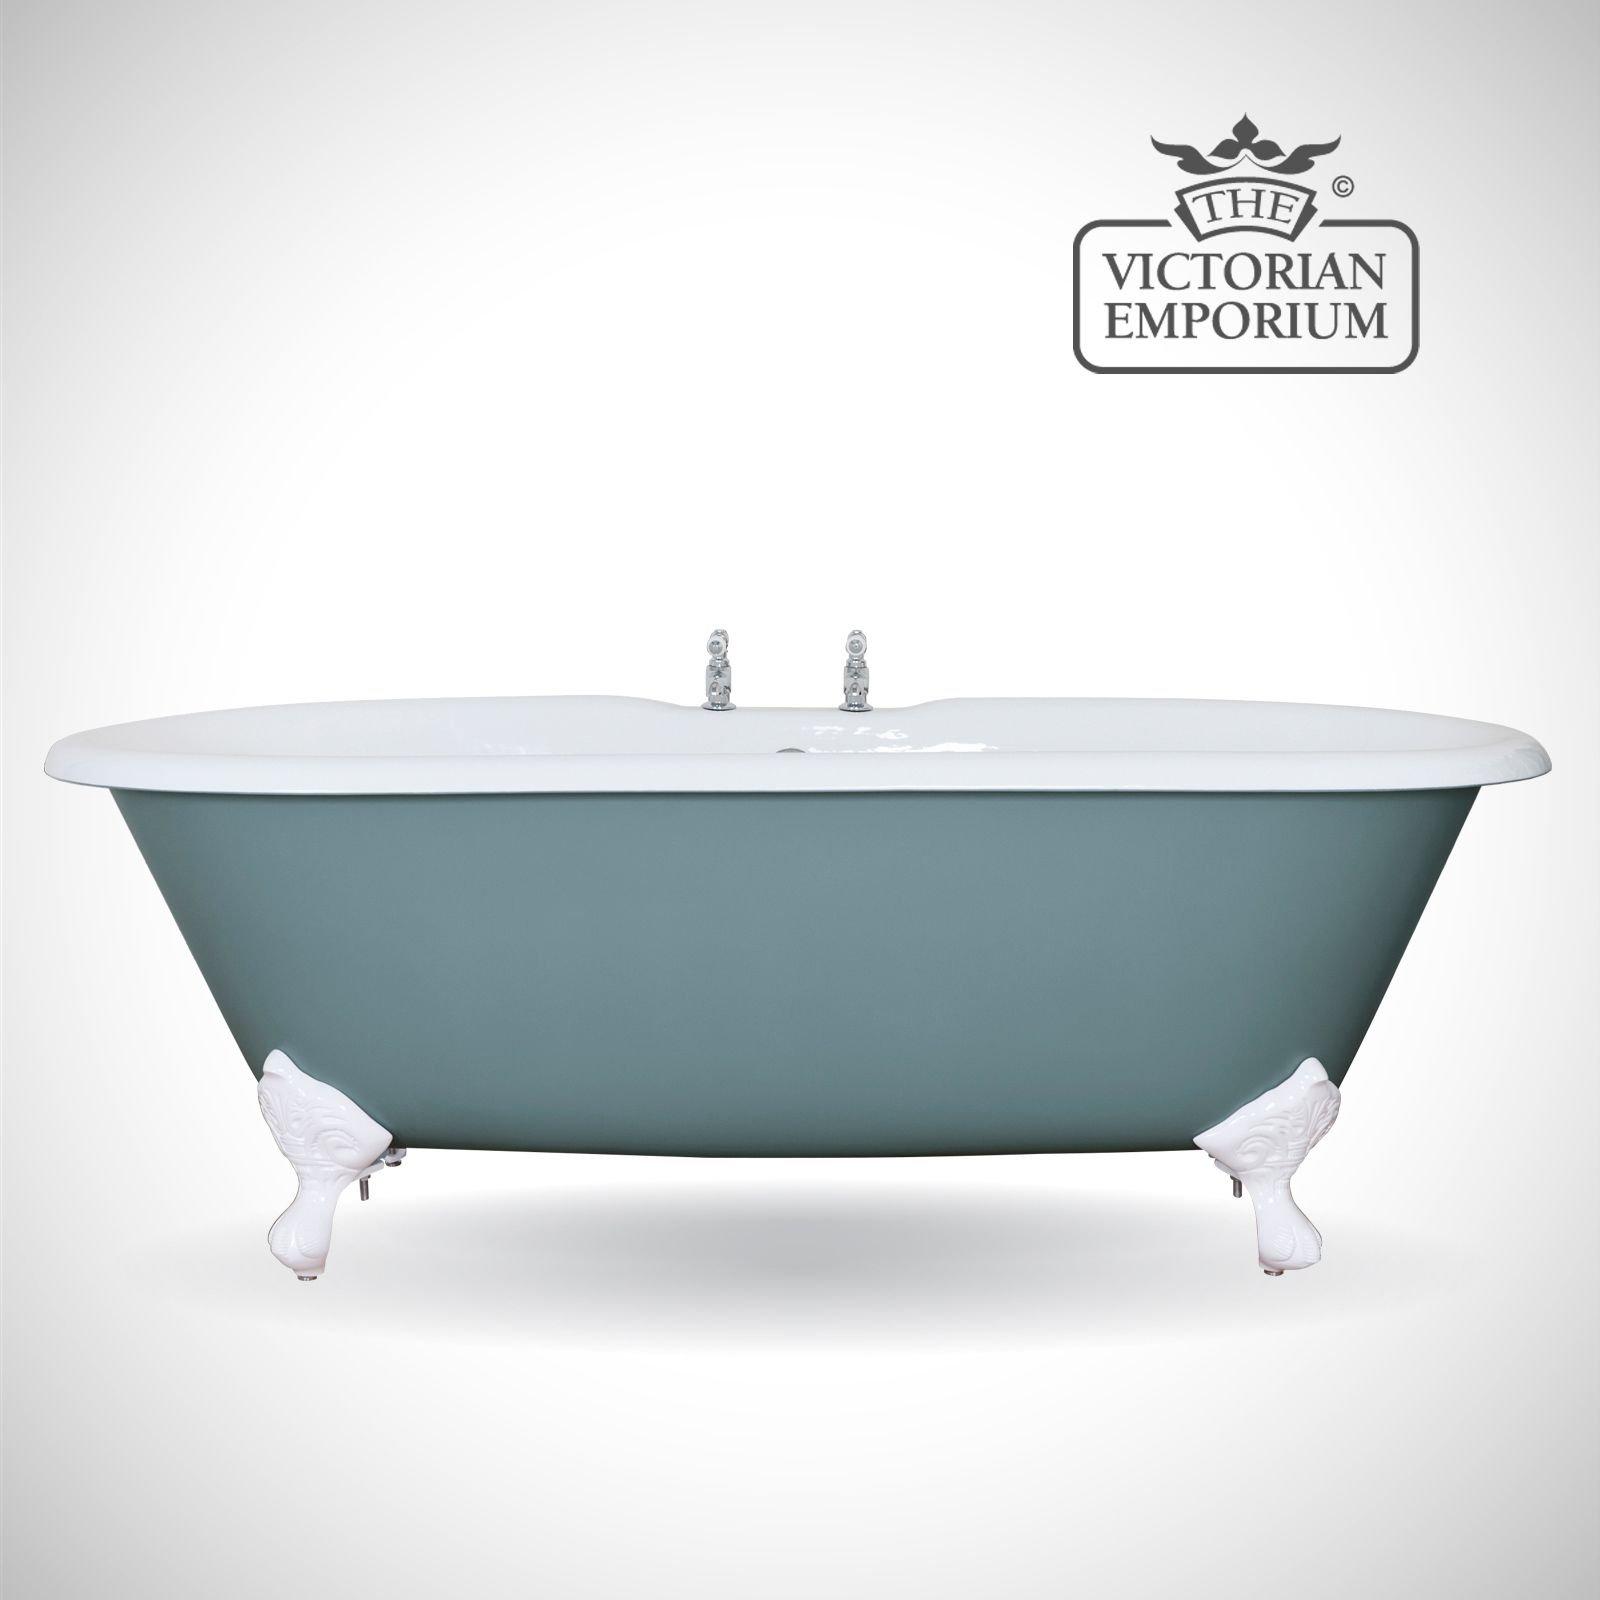 Bisleigh cast iron bath - painted | Baths